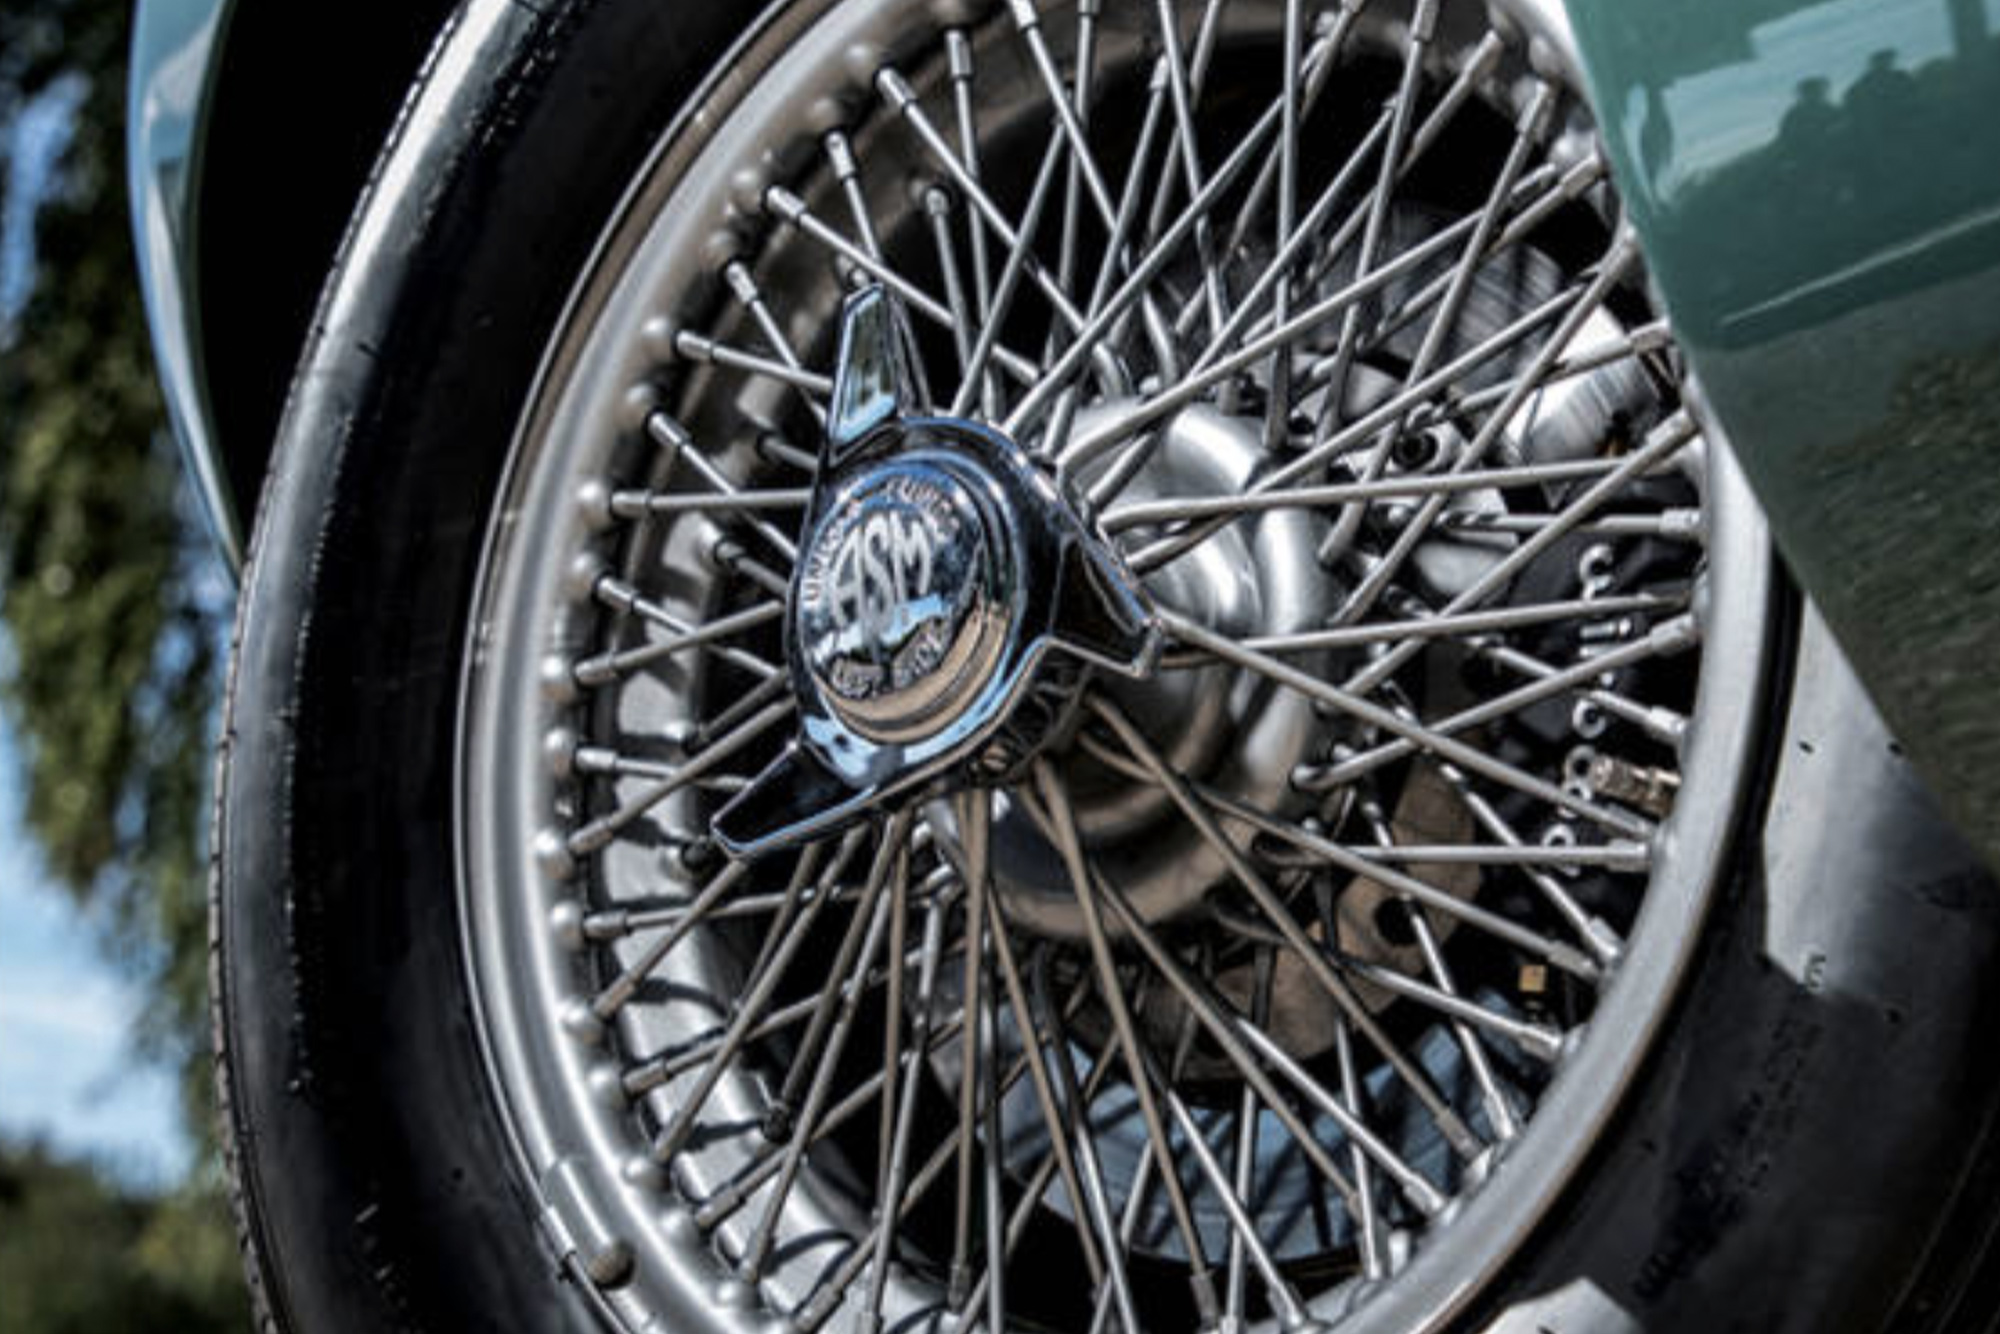 ASM R1 Le Mans wheel